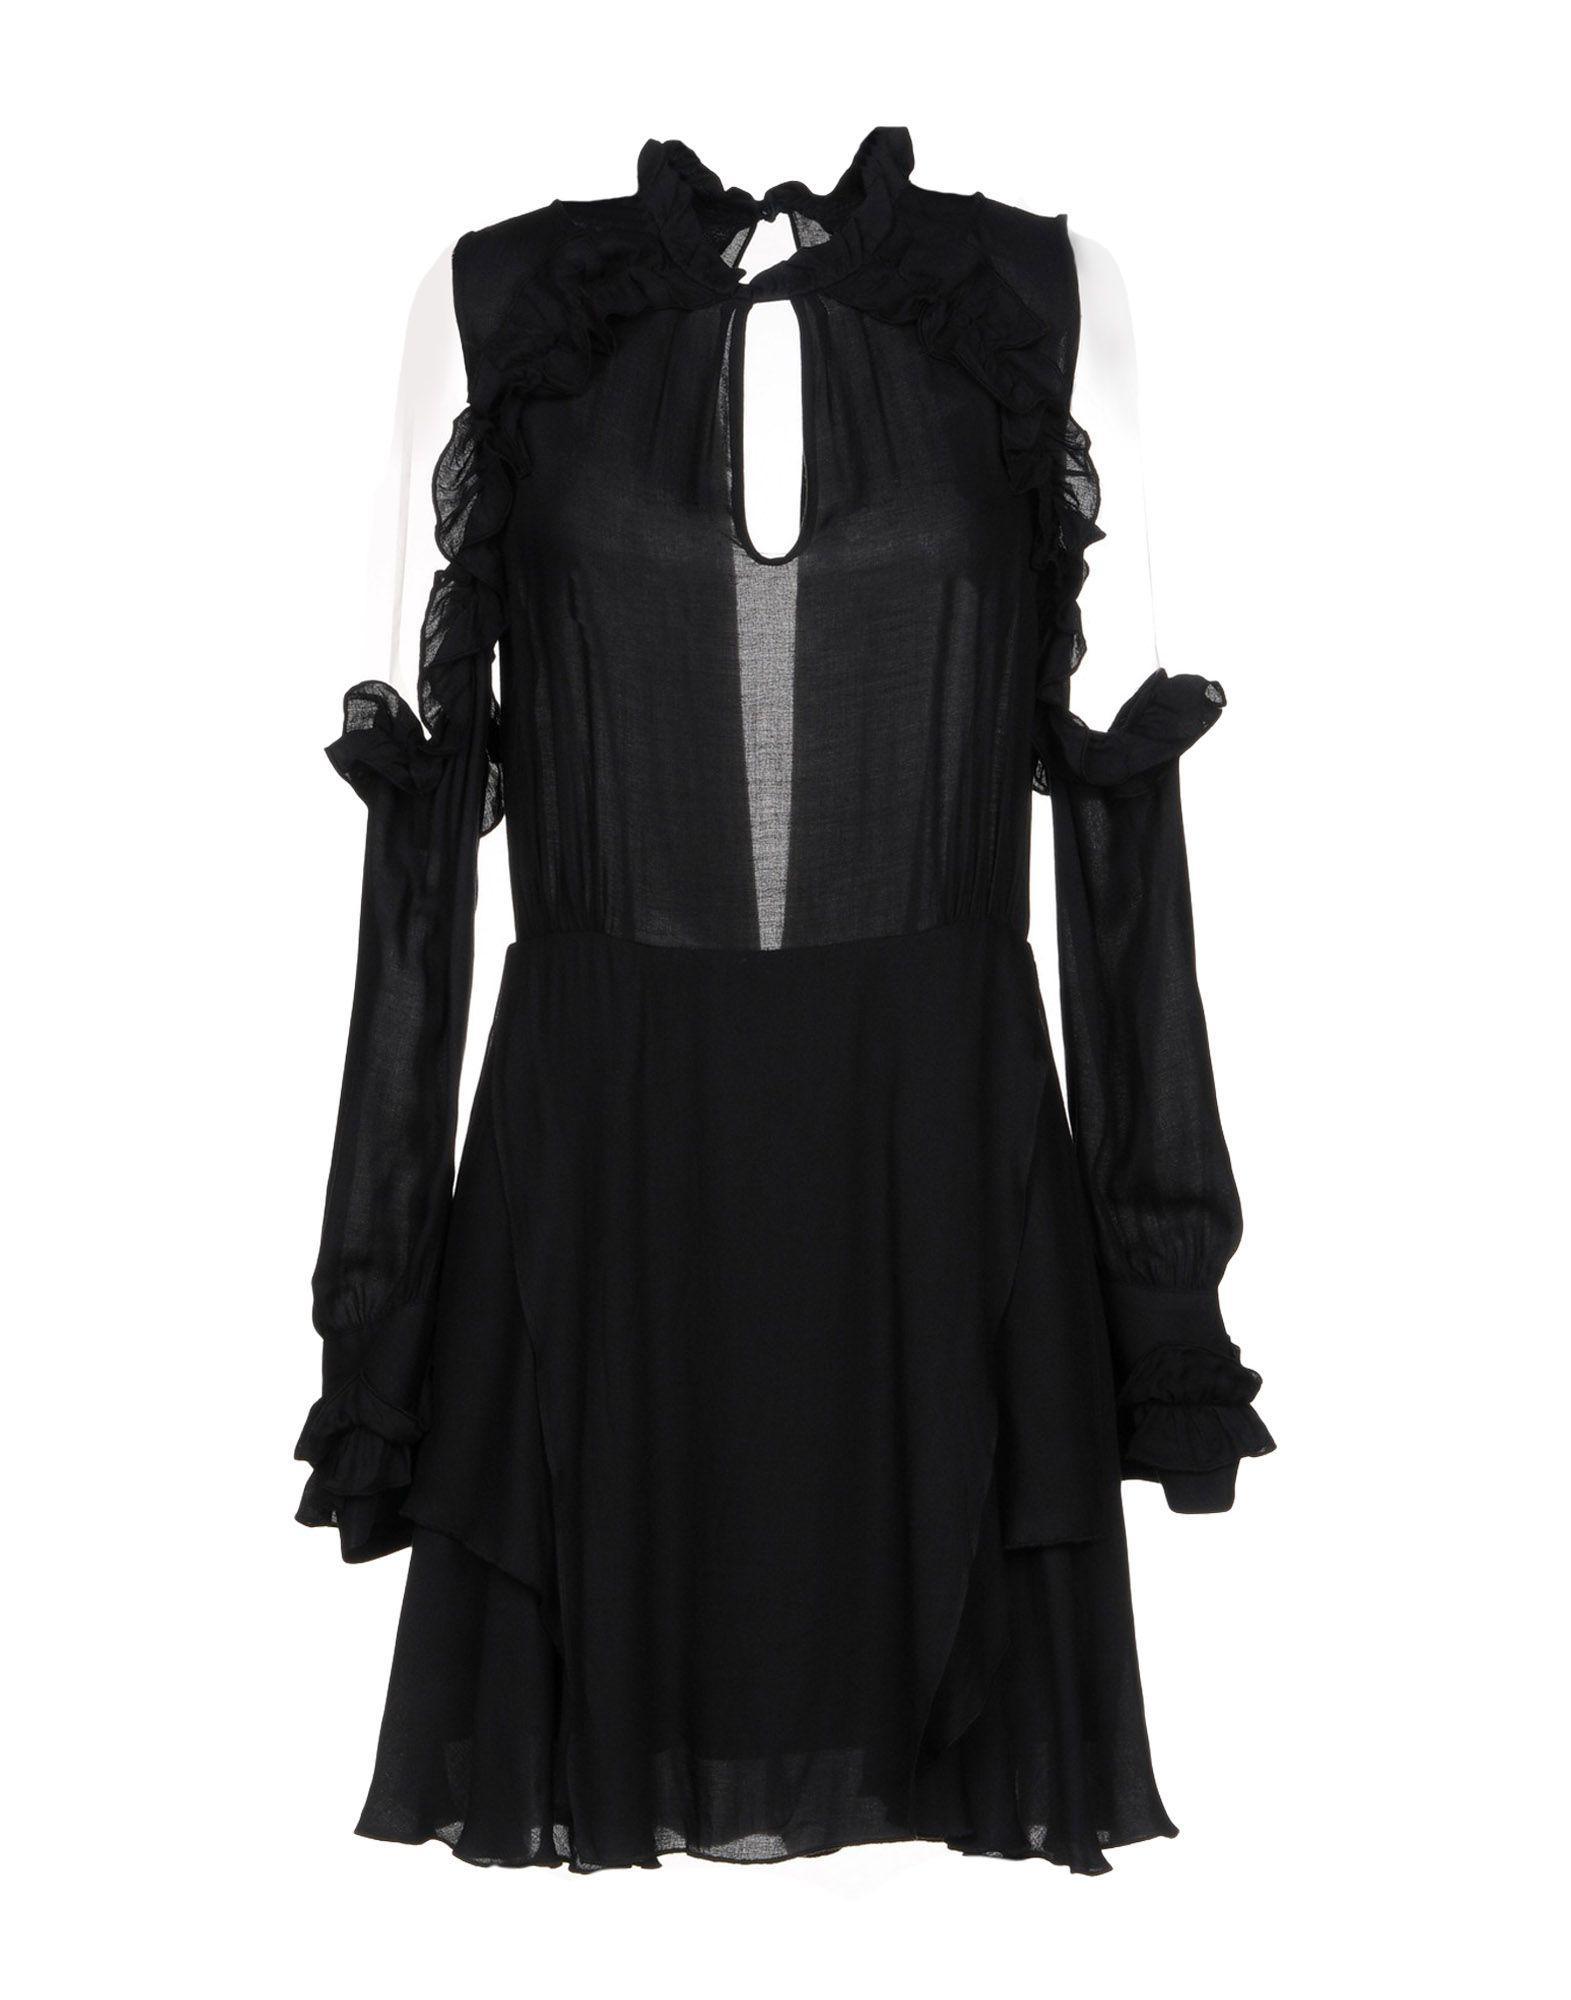 Lyst - Robe courte Iro en coloris Noir 873f0734ea52